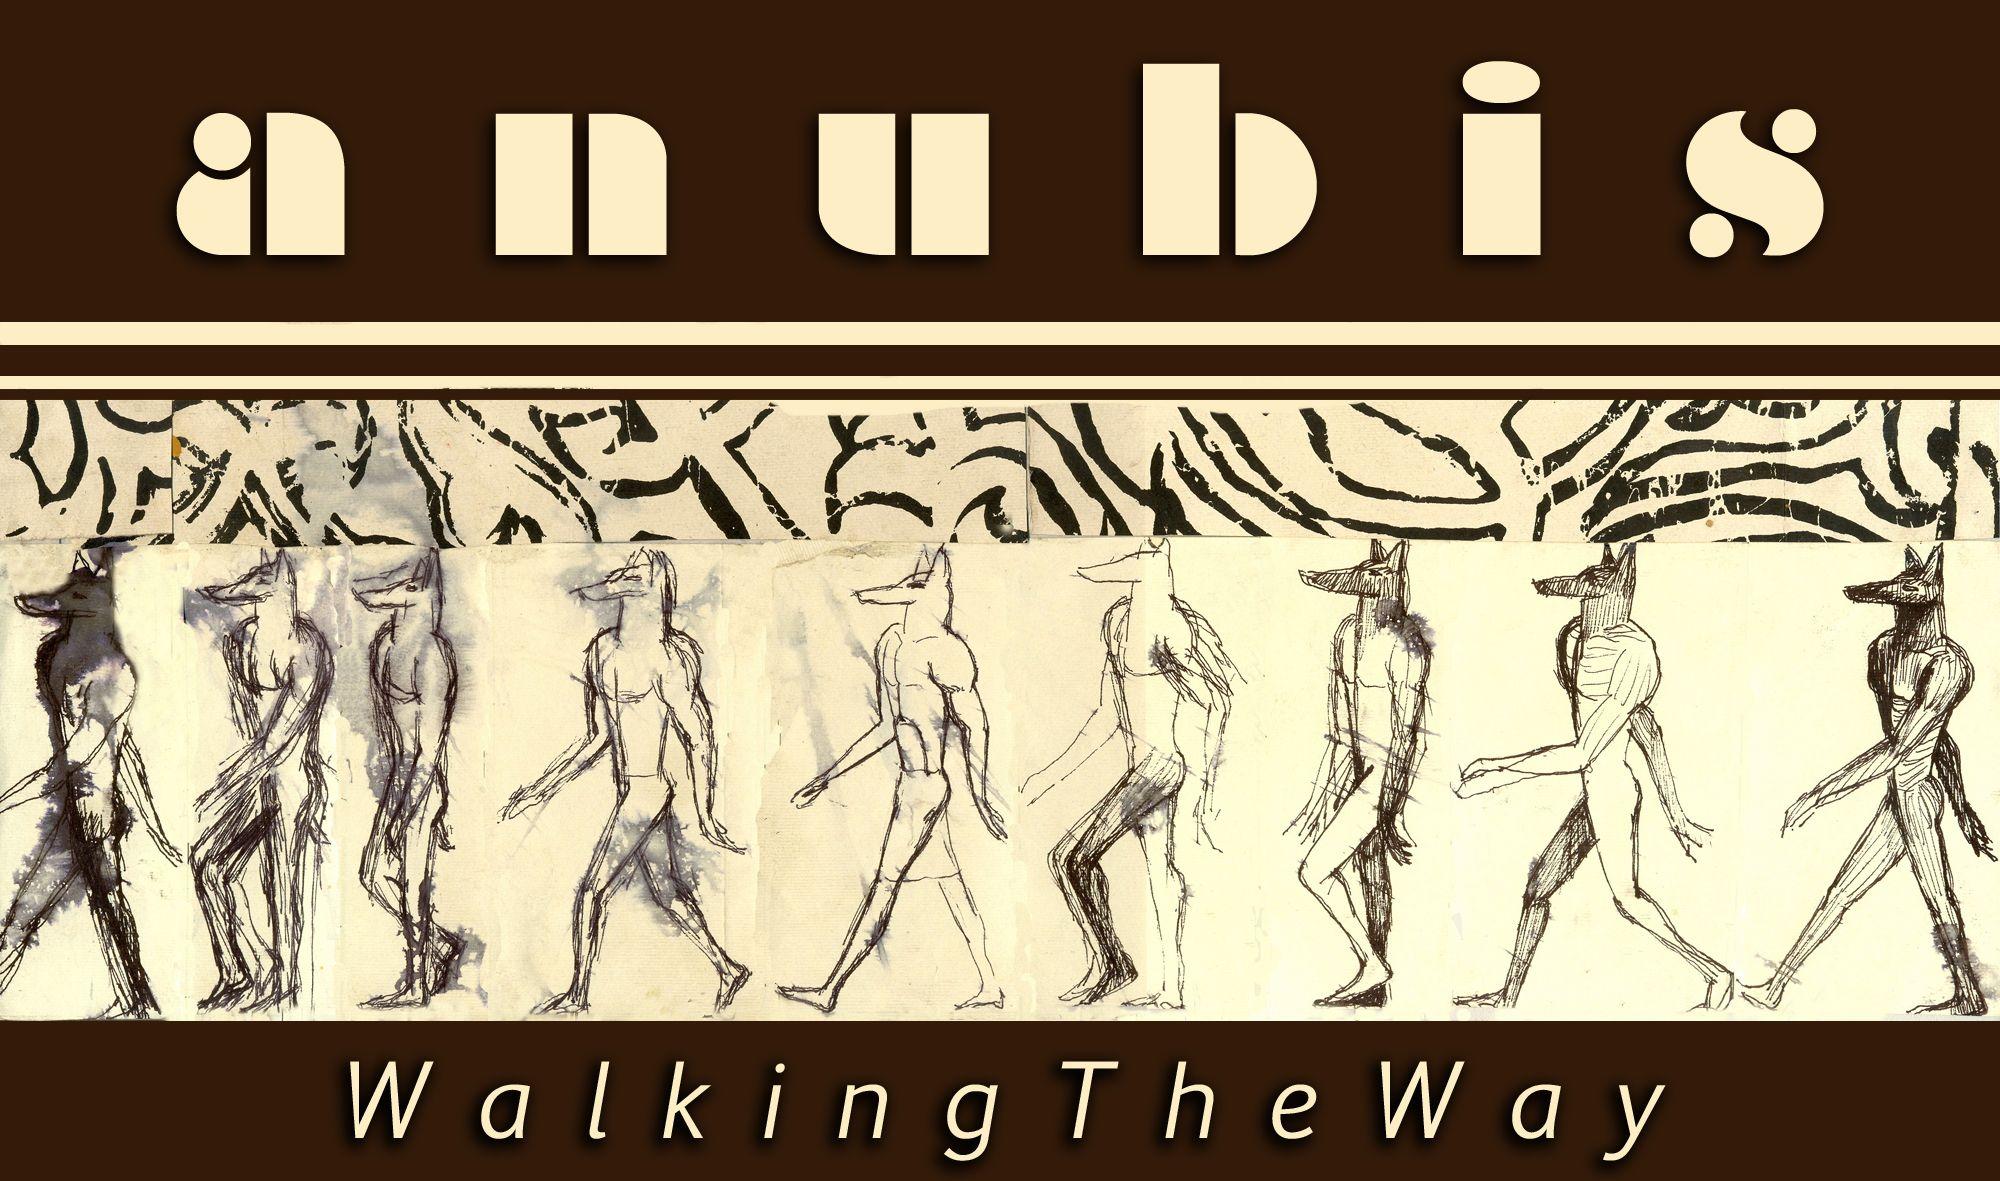 ANUBIS graphic design by Cosima Lukashevich www.lukashevich.com